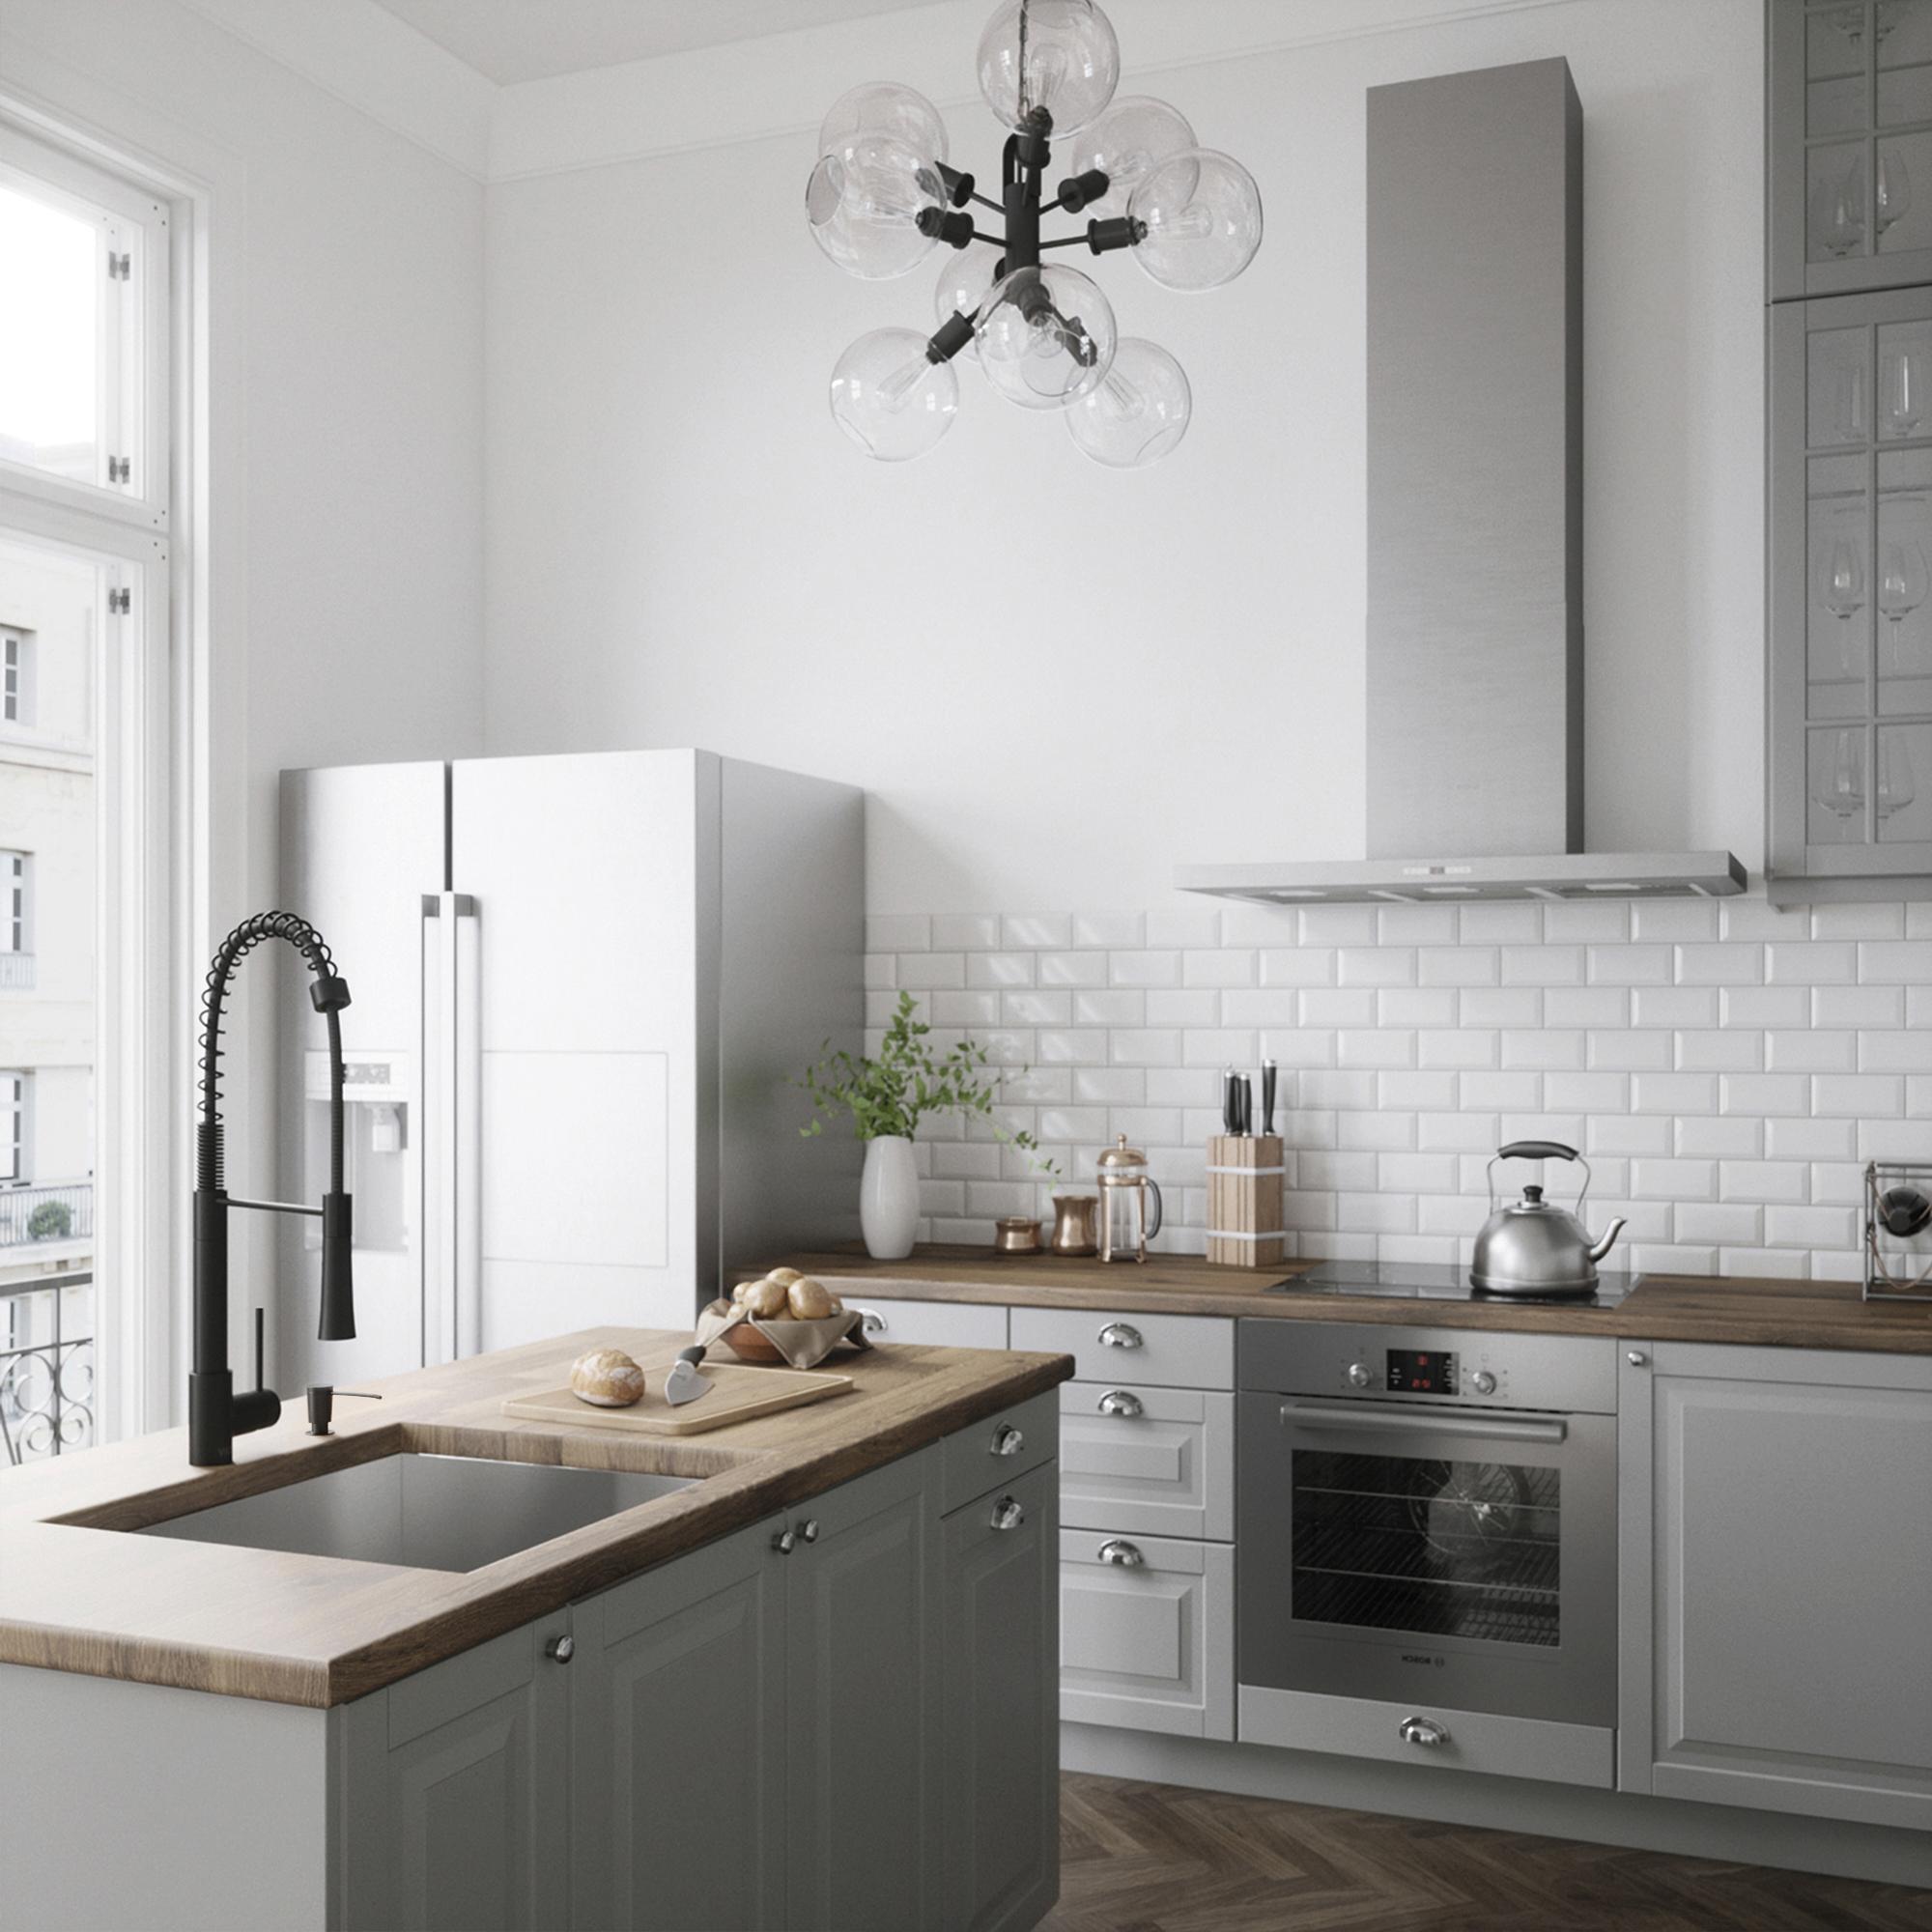 Vigo Laurelton Pull Down Spray Kitchen Faucet In Matte Black vigo laurelton pull-down spray kitchen faucet - matte black